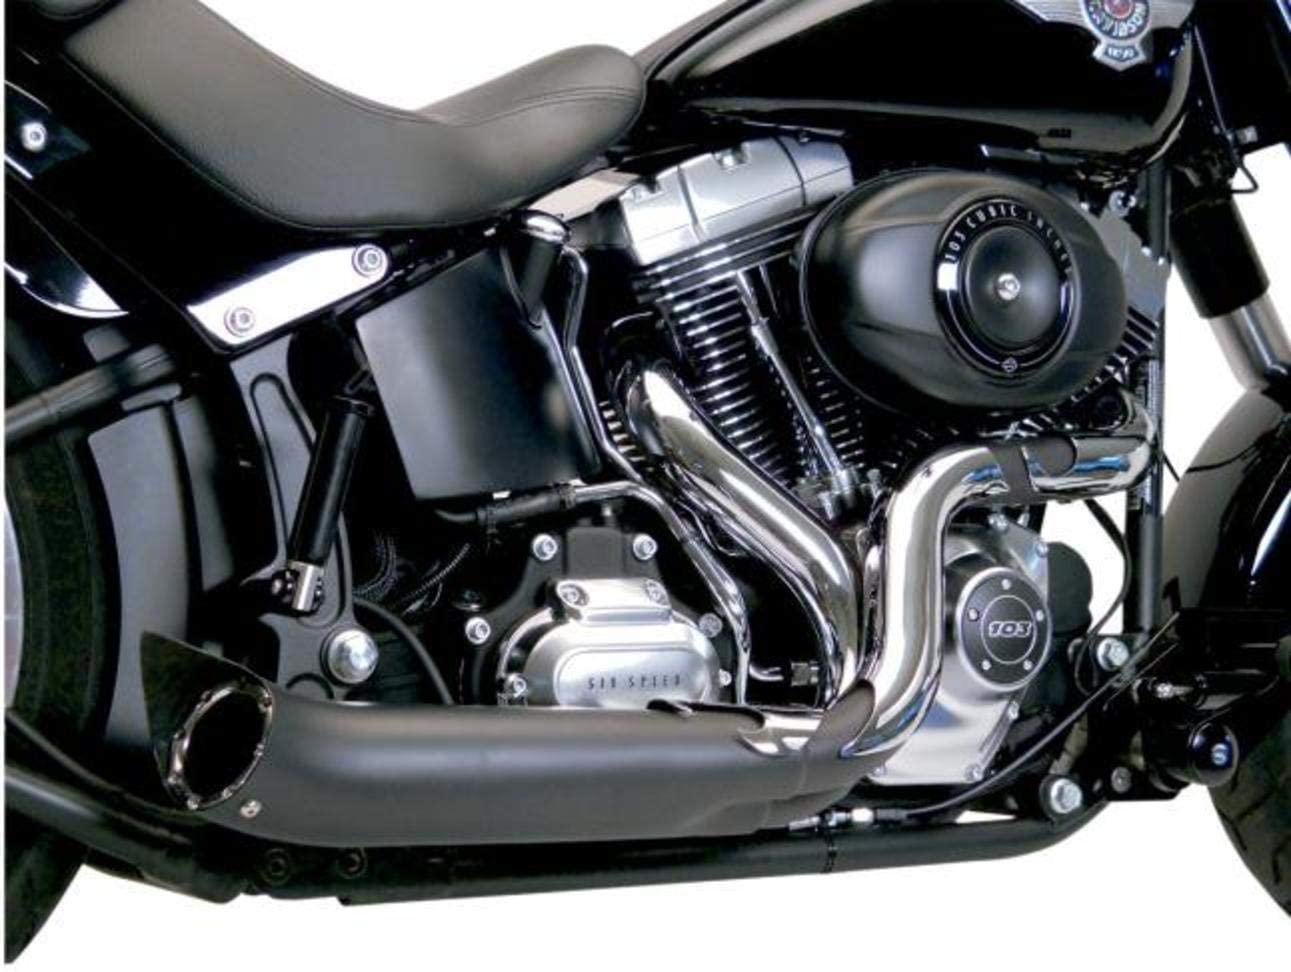 SuperTrapp Phantom II Exhaust System - Black , Color: Black 138-71680